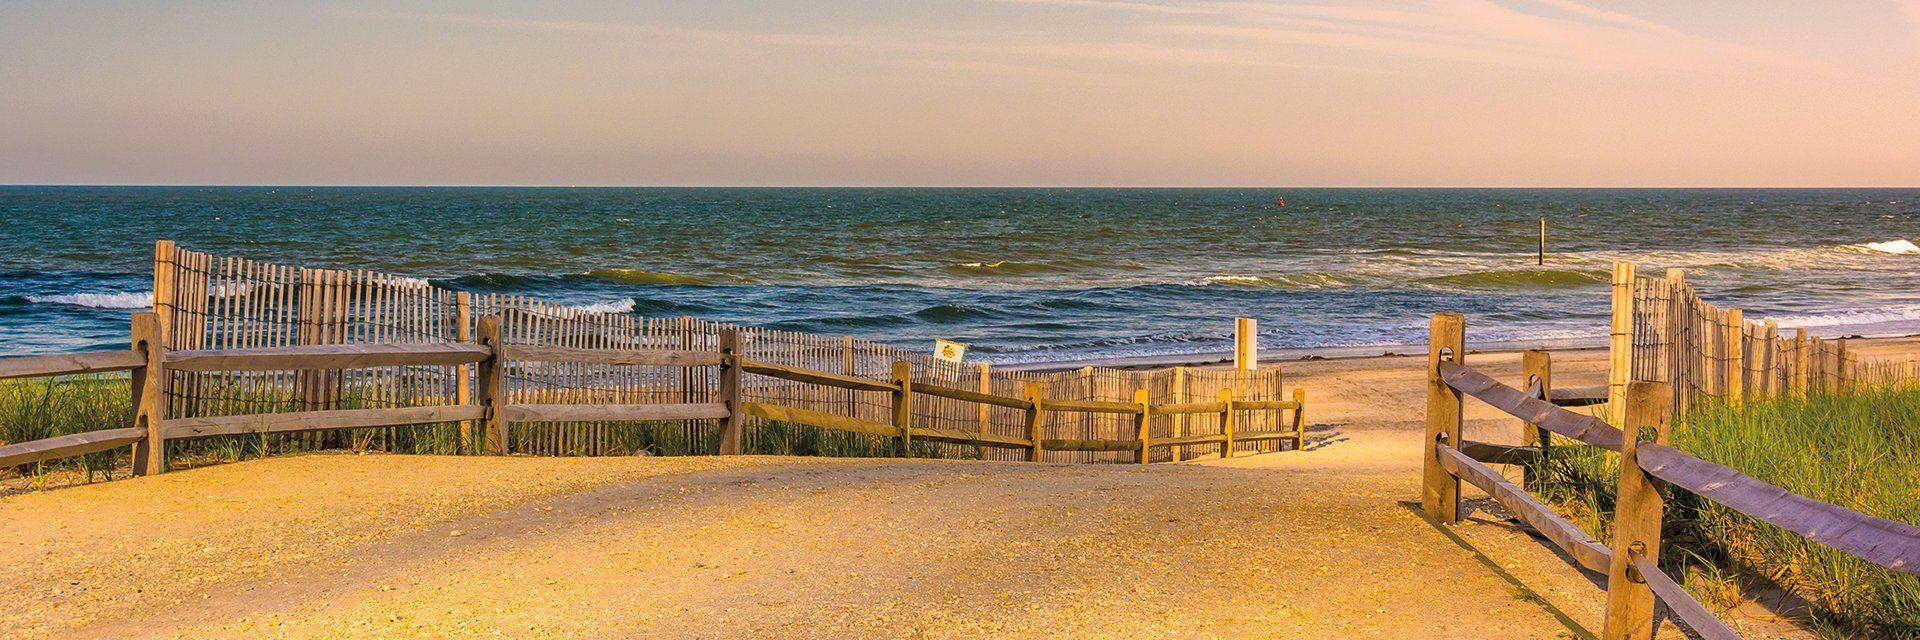 Wildwood et Atlantic City